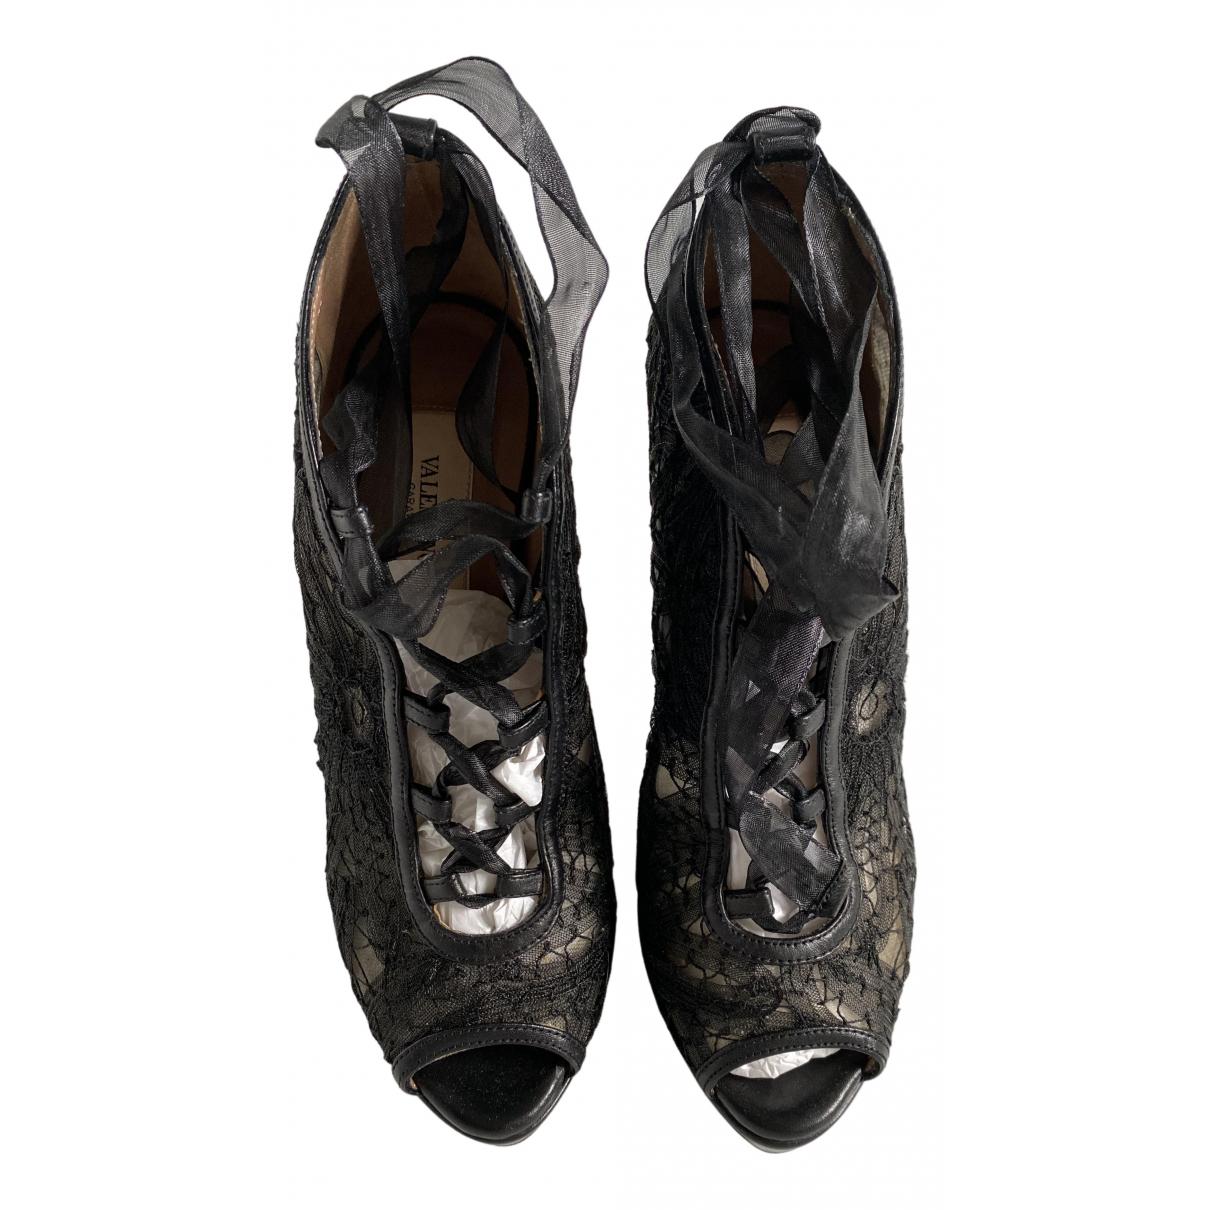 Valentino Garavani N Black Leather Heels for Women 35 EU